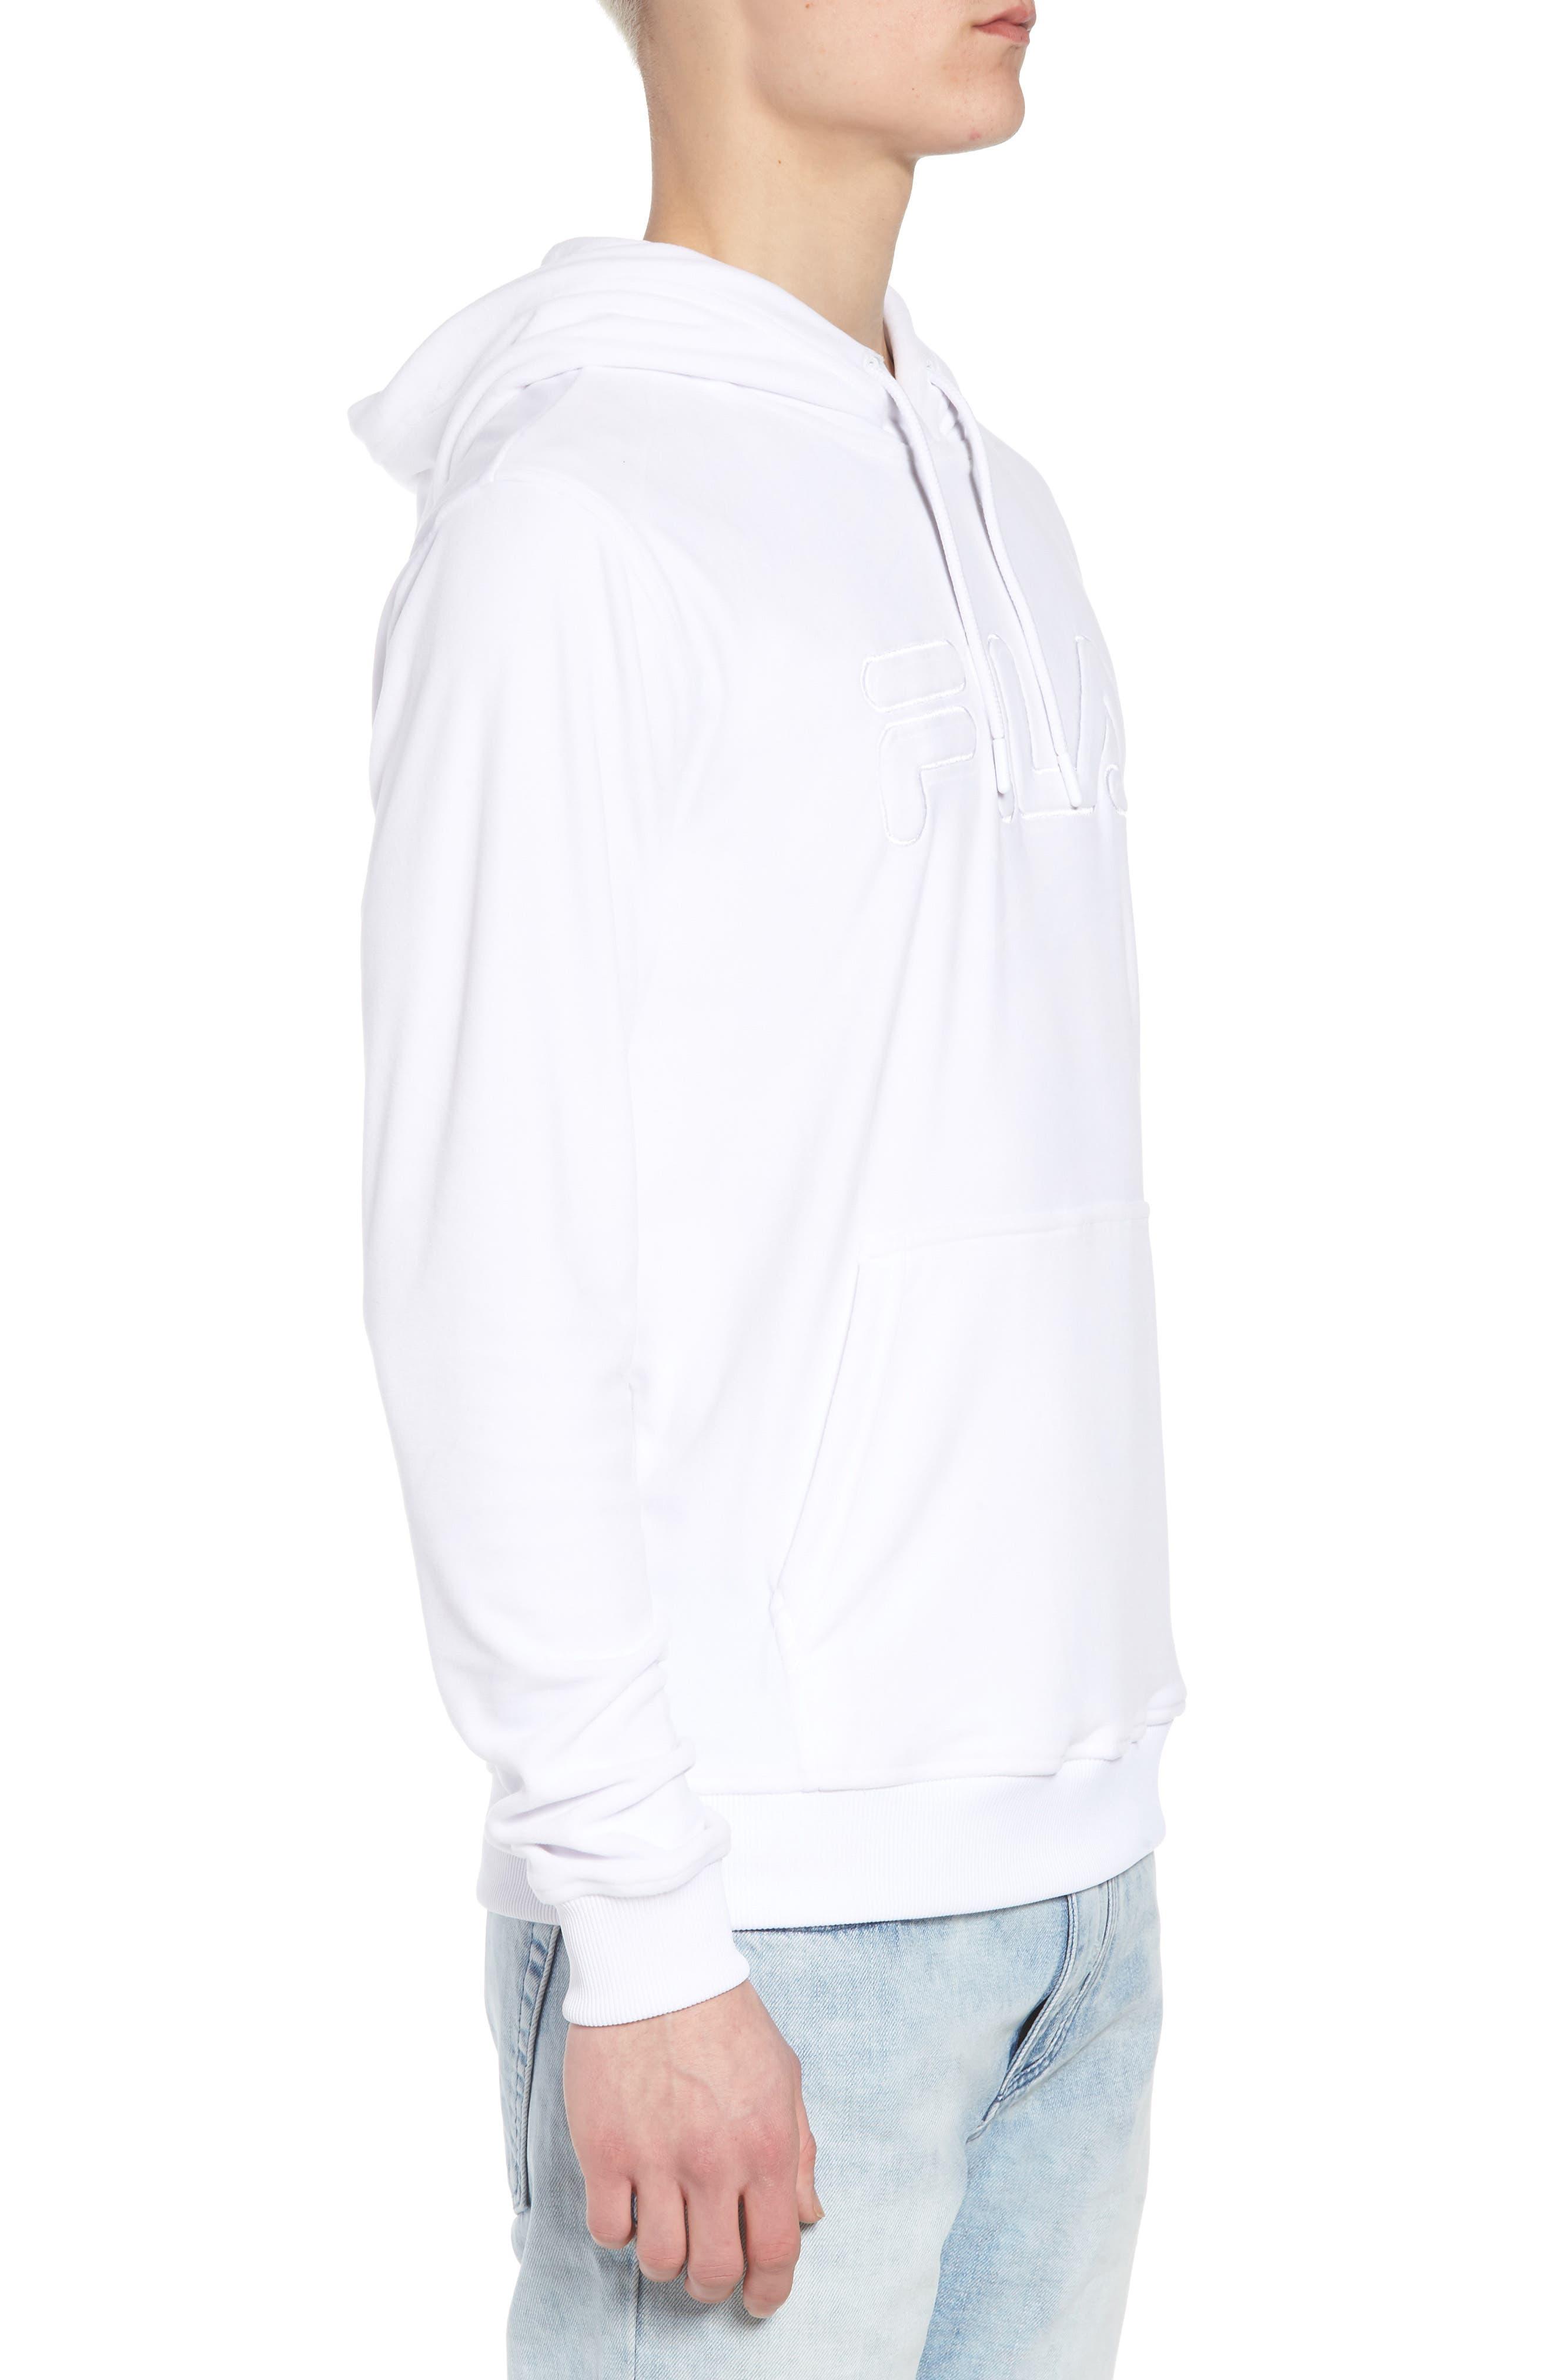 Asher Velour Hoodie Sweatshirt,                             Alternate thumbnail 3, color,                             100